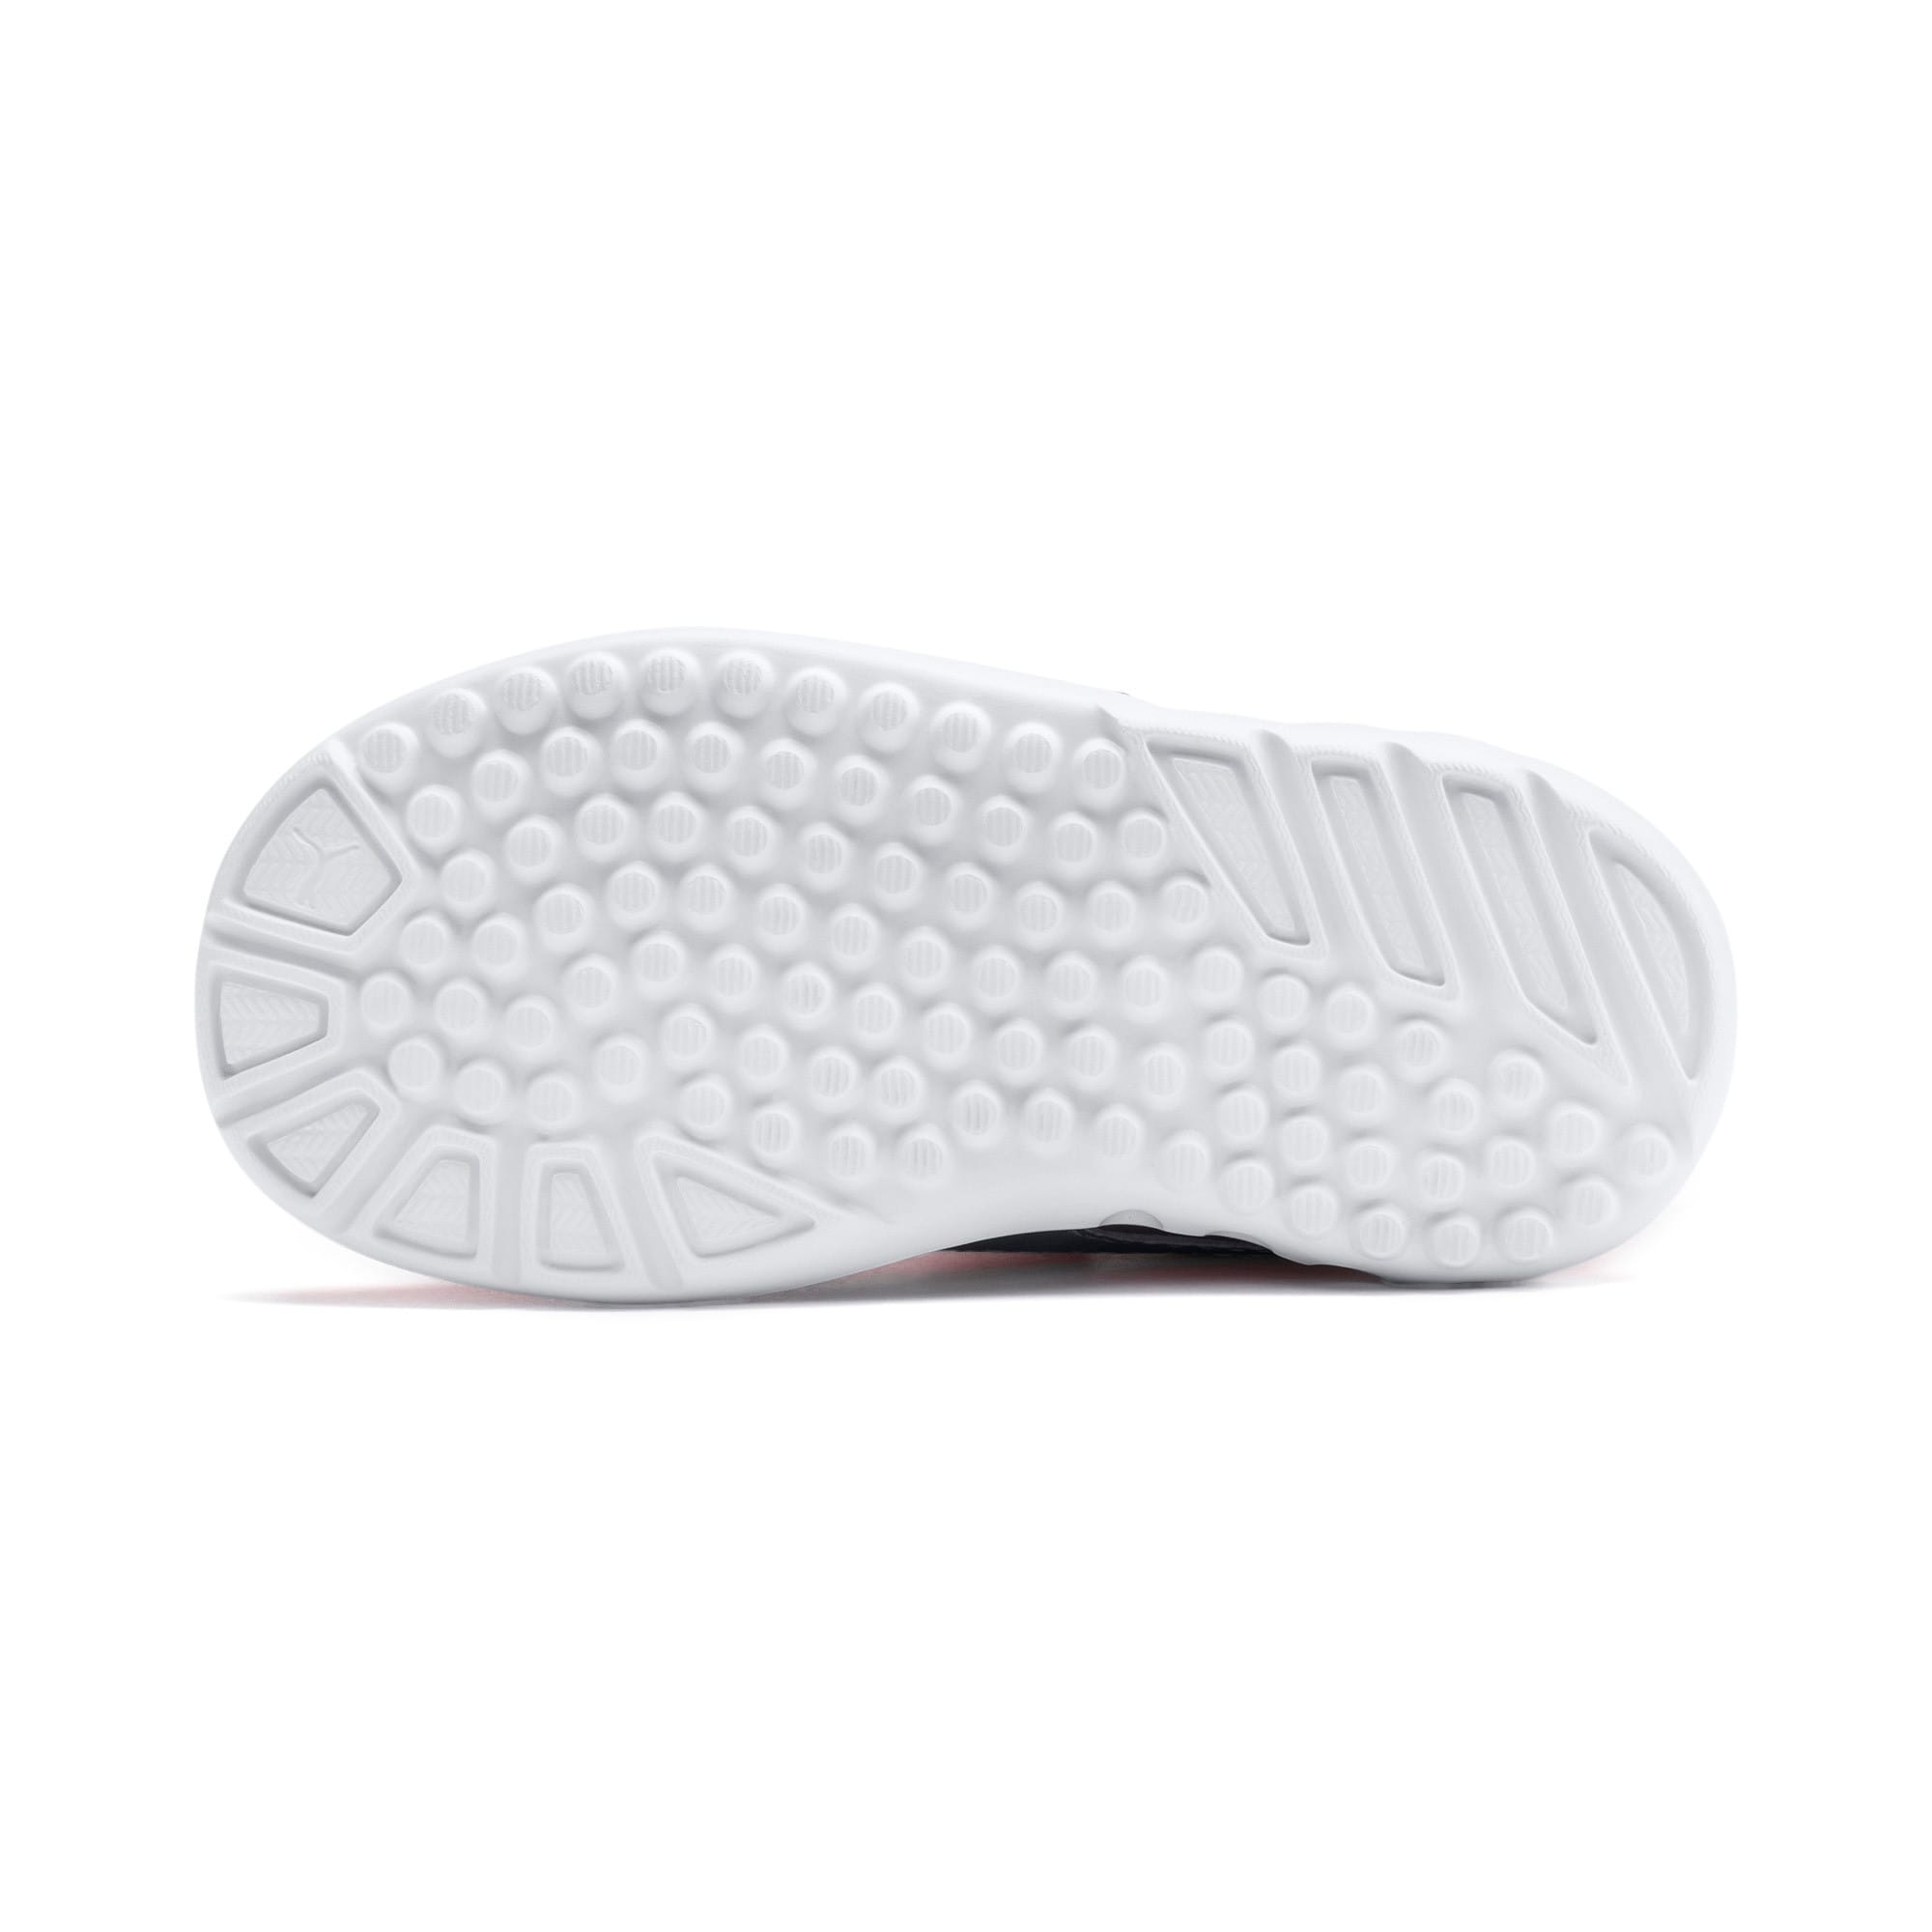 Thumbnail 4 of Carson 2 Glitz Toddler Shoes, Nrgy Rose-Silver, medium